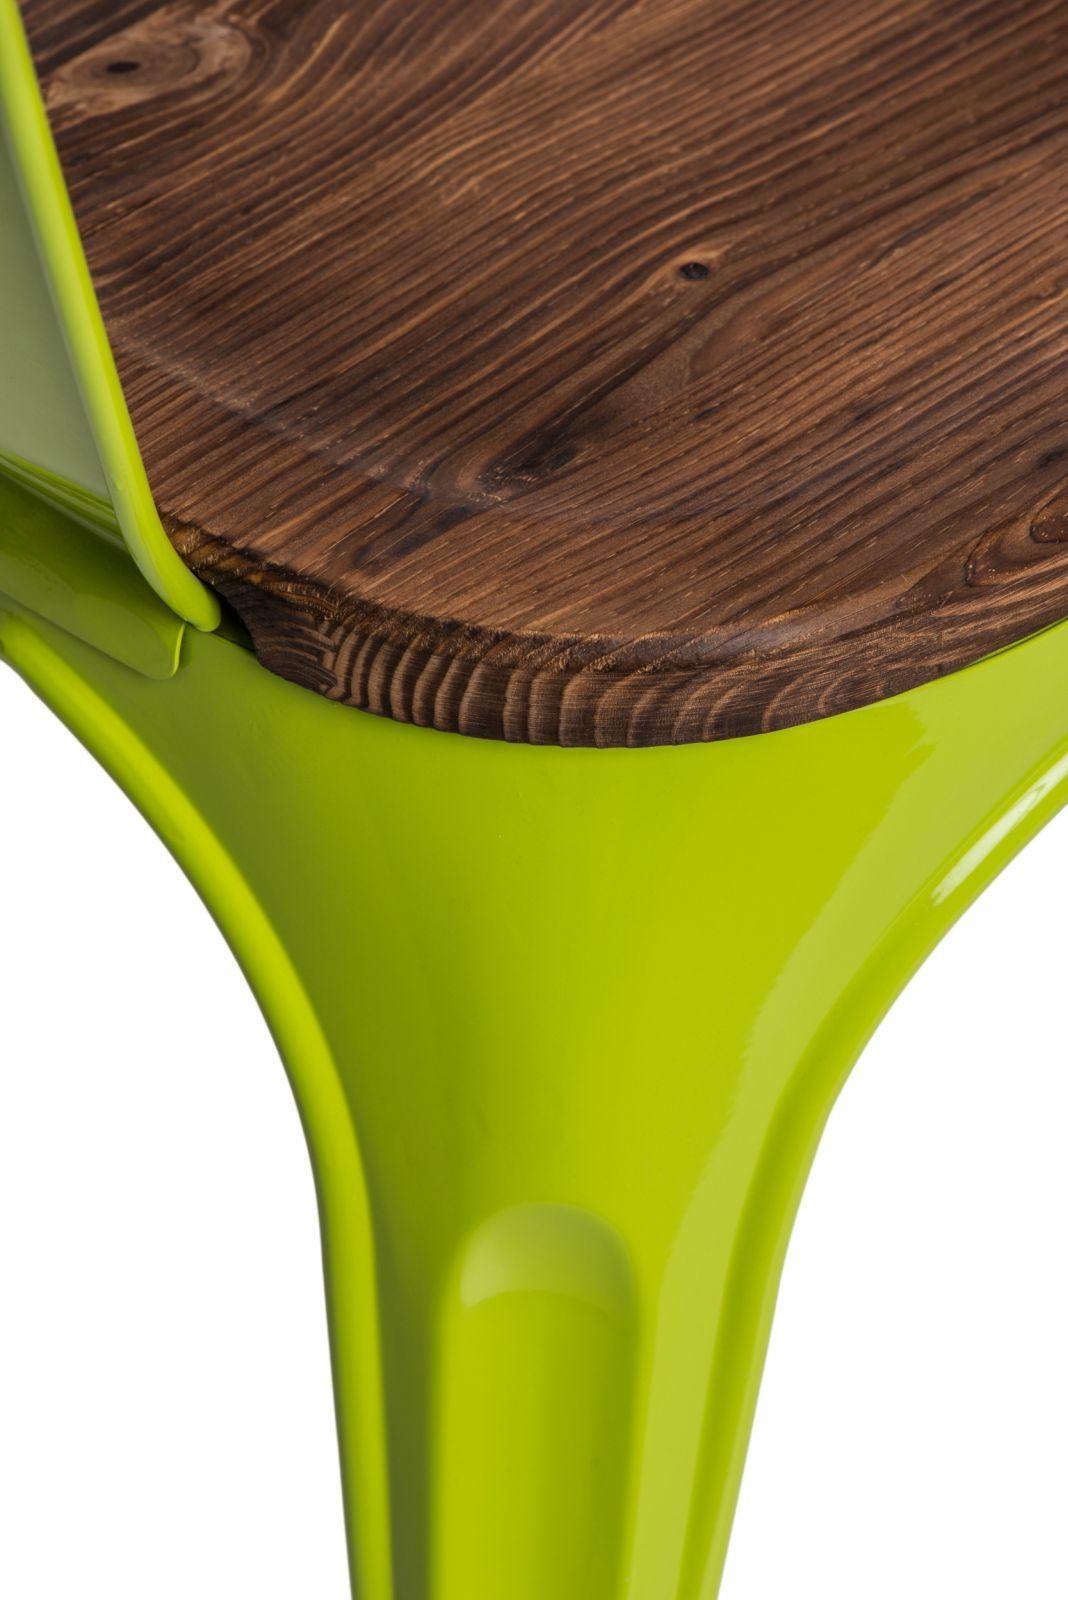 D2 Krzesło Paris Arms Wood ziel jasny sosna